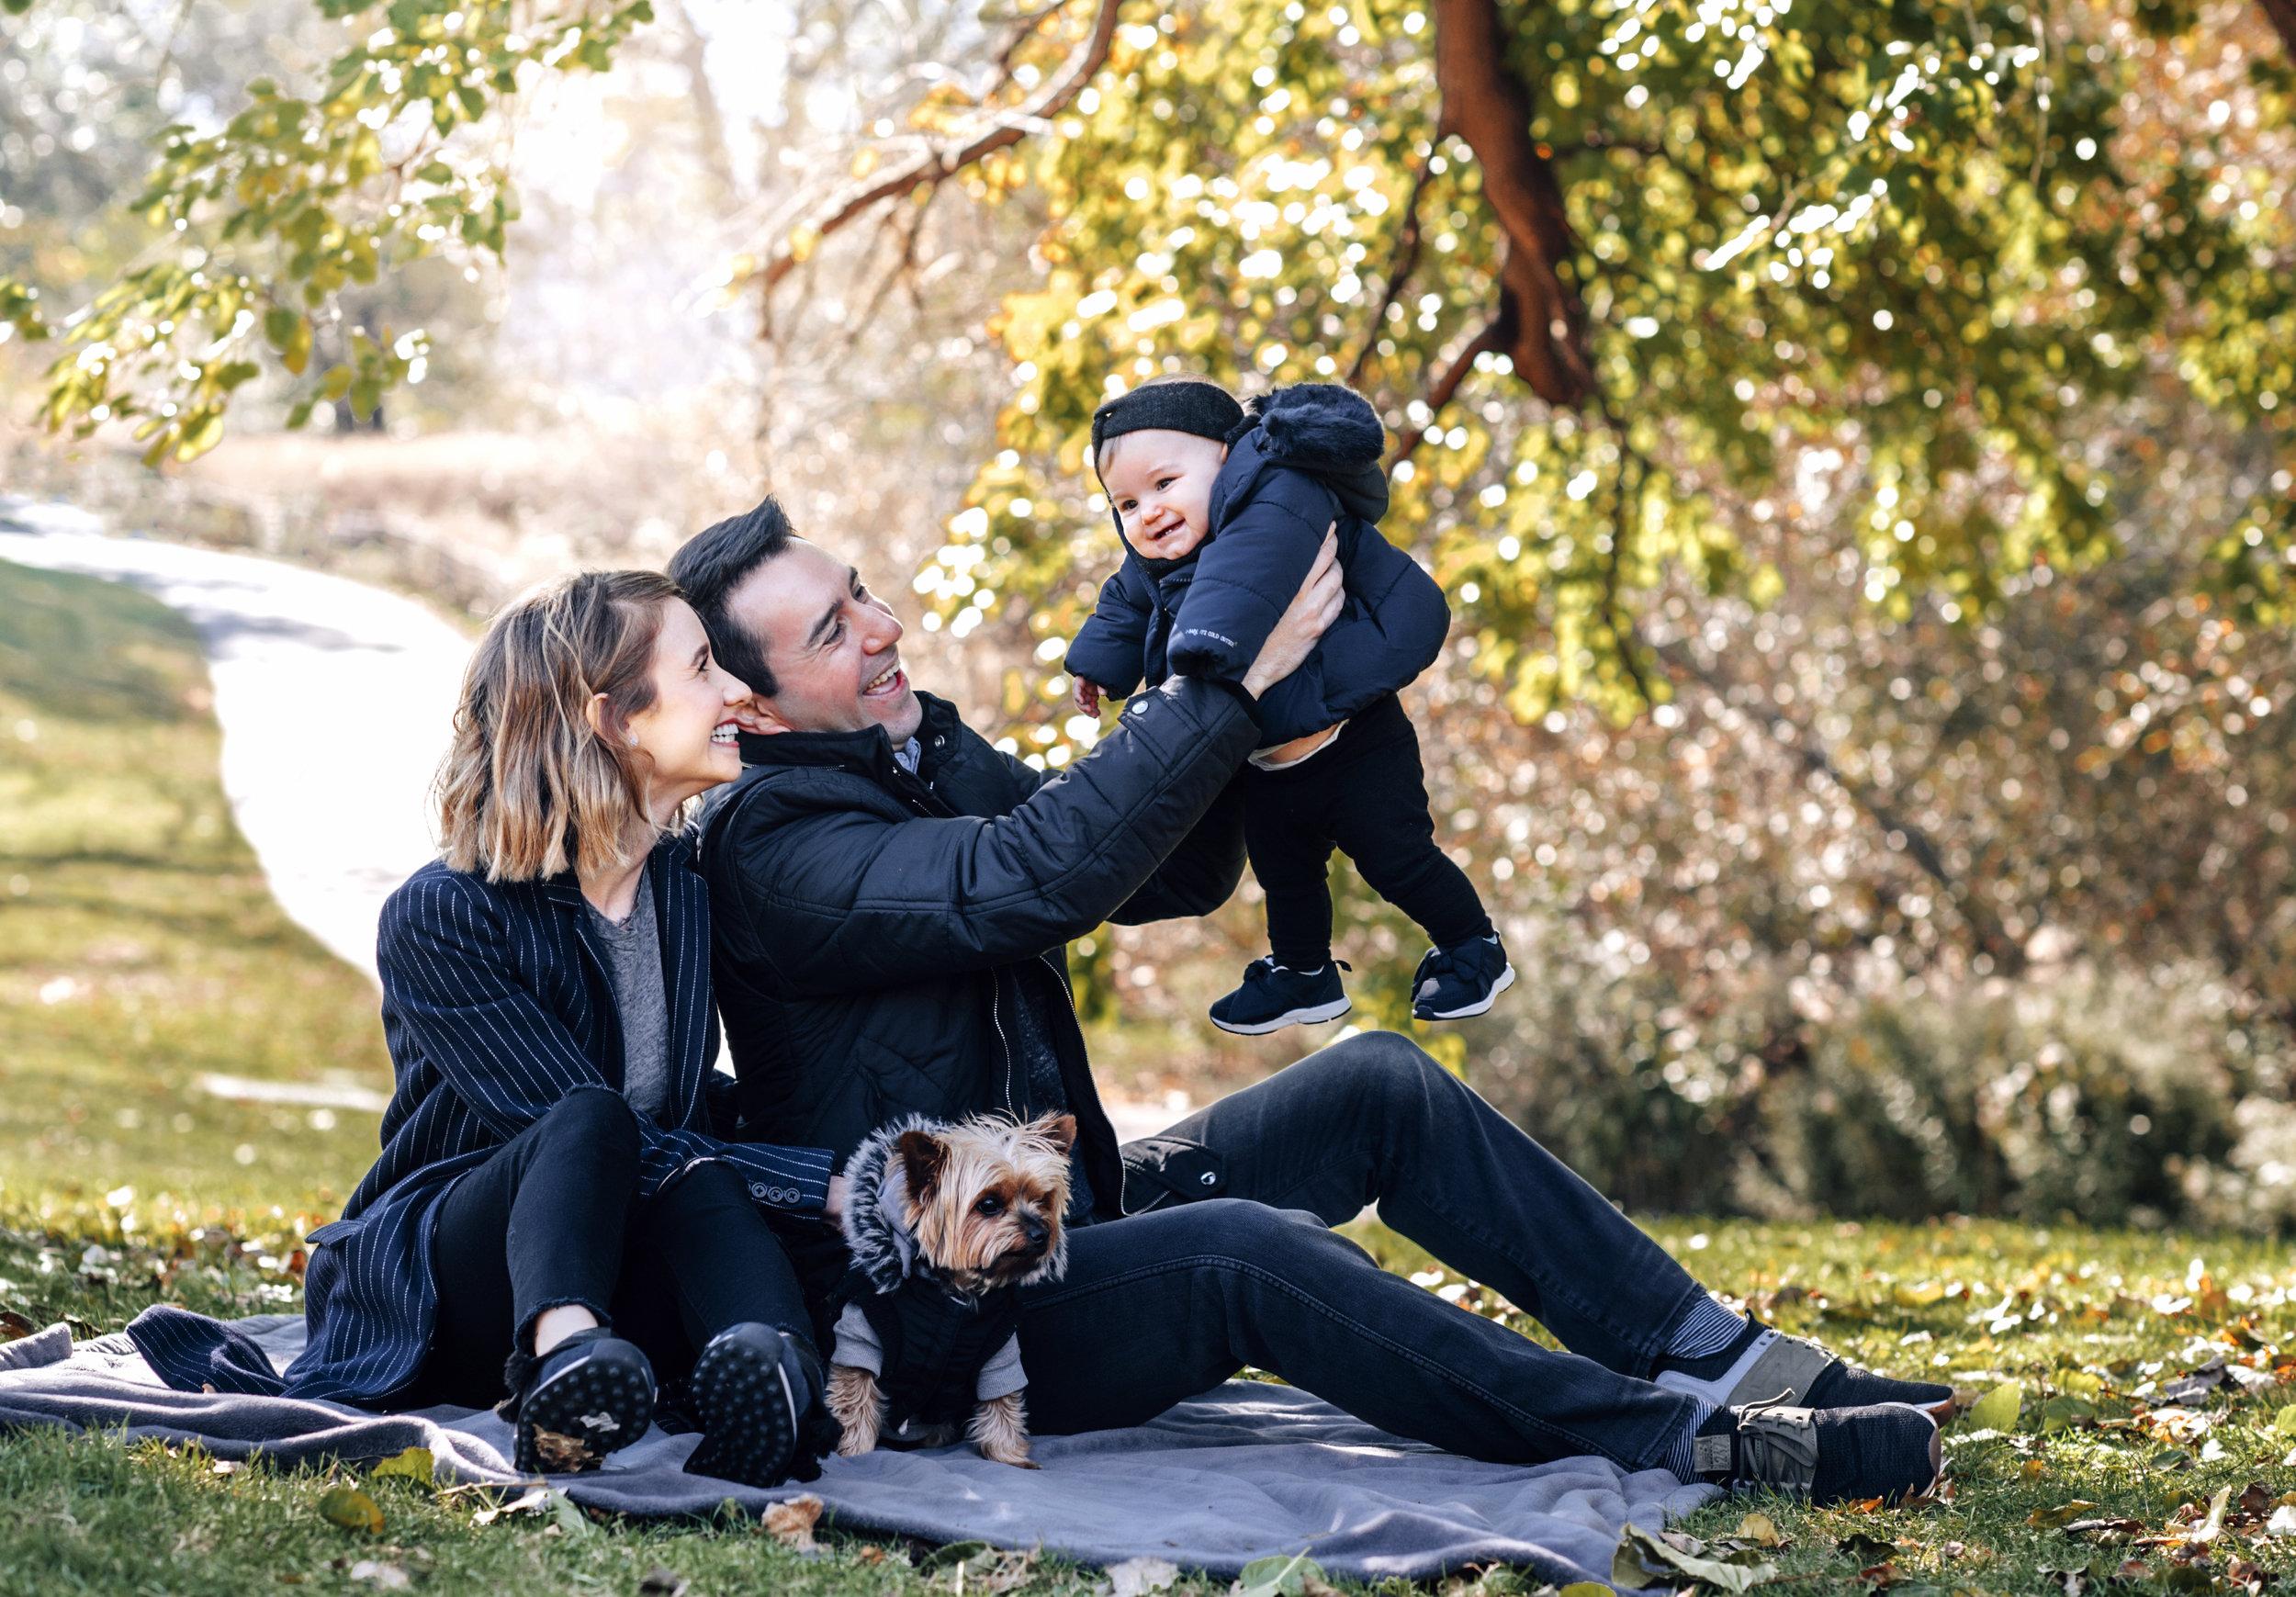 creative motherhood series: megan jedlinksi